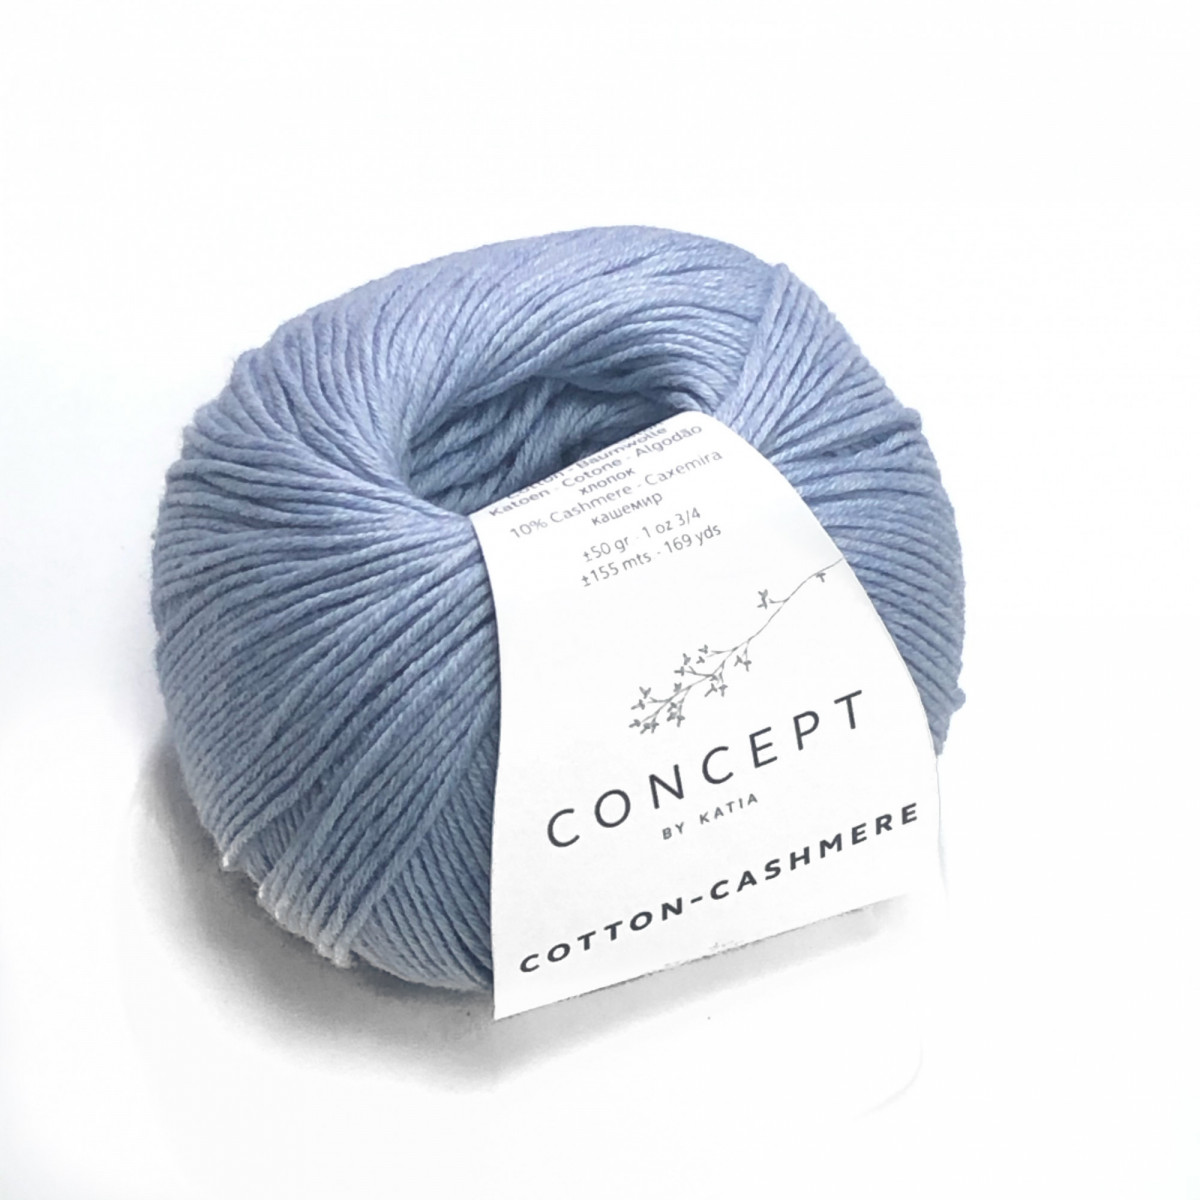 Пряжа Катя Концепт Коттон Кашемир (Concept Cotton-cshemere)